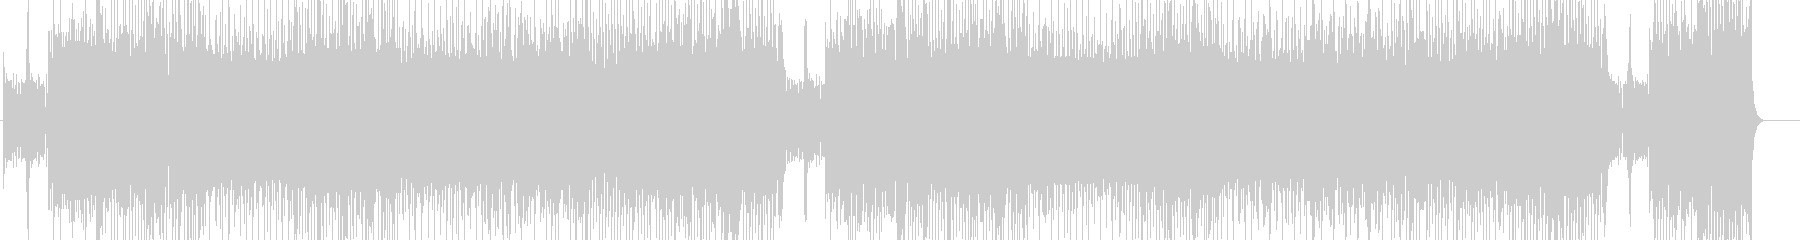 「HR/HM」「DARK」BGM156の未再生の波形